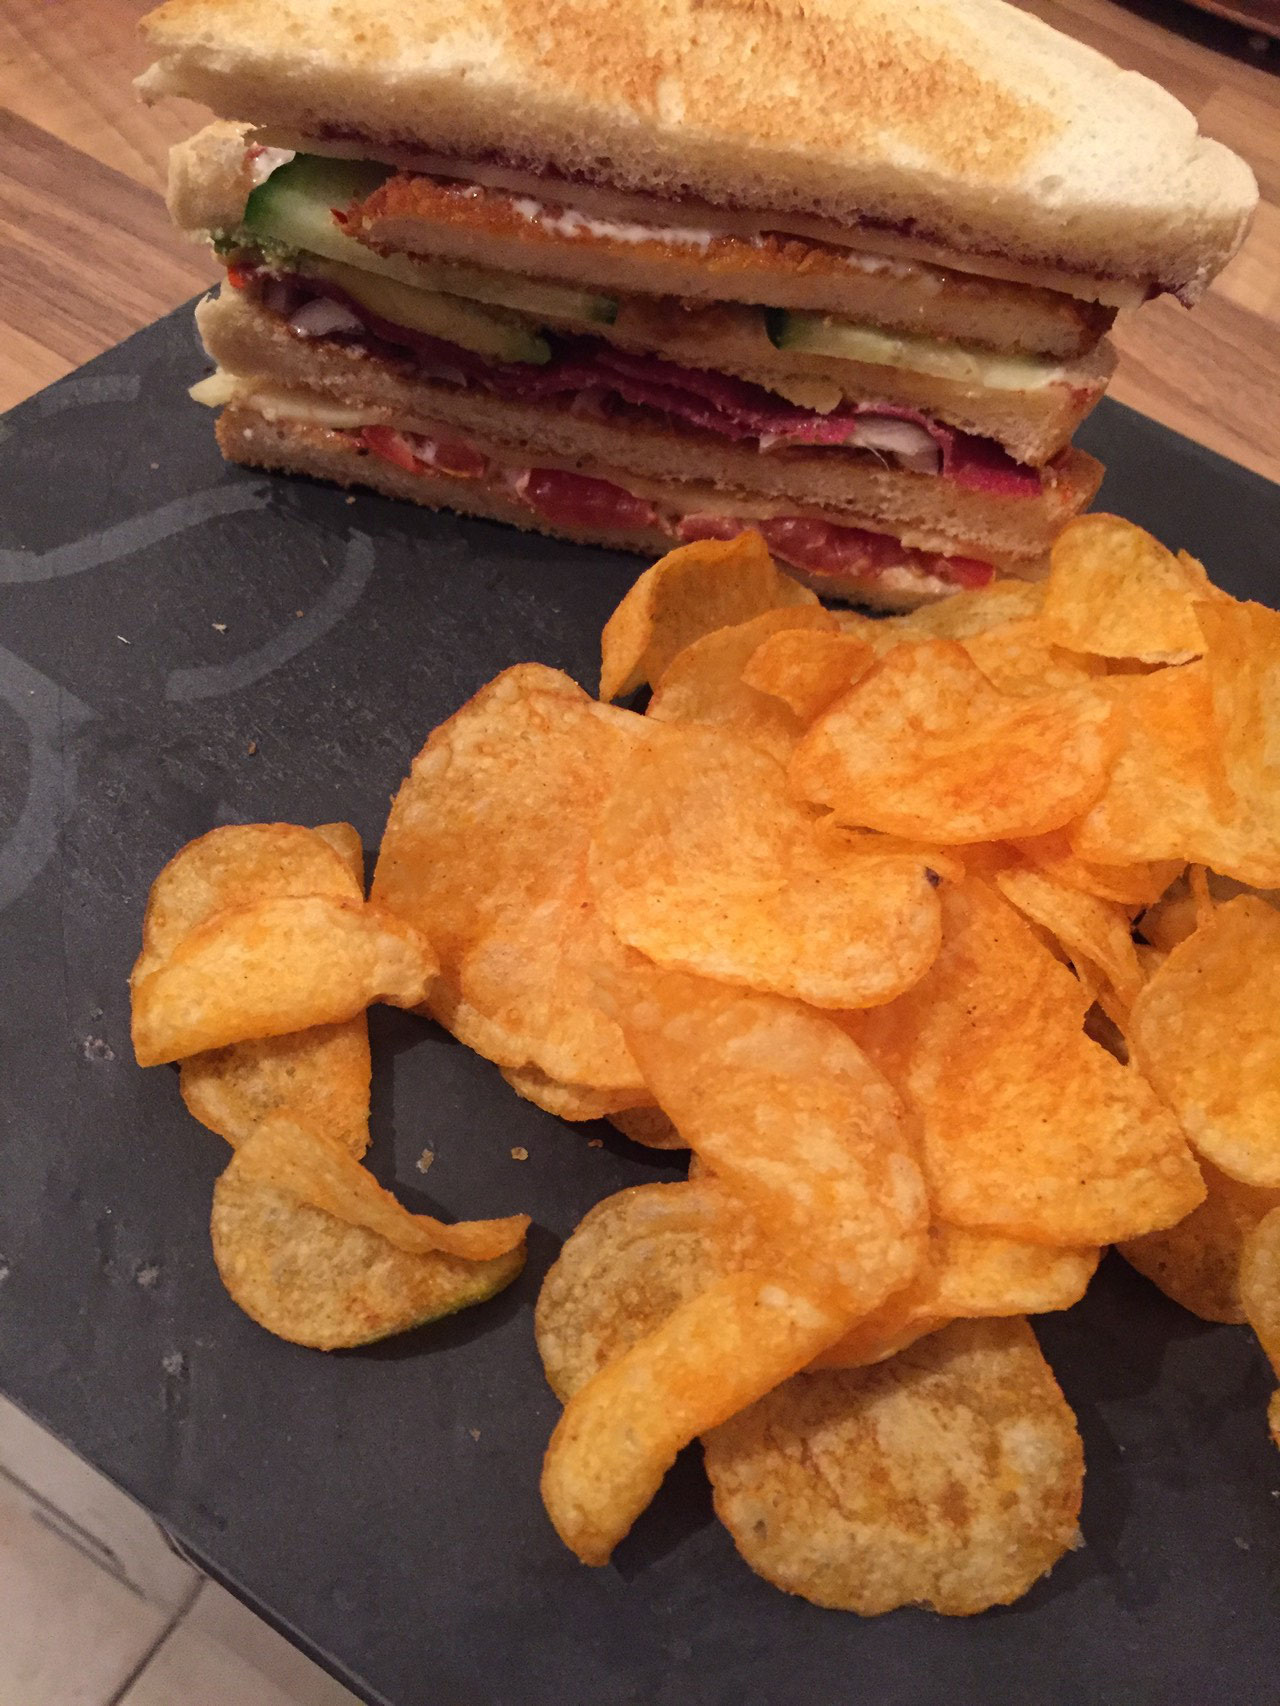 Rezept Club-Sandwich a la Maus mit Acovado, Schnitzel und Feigensenf Kaese